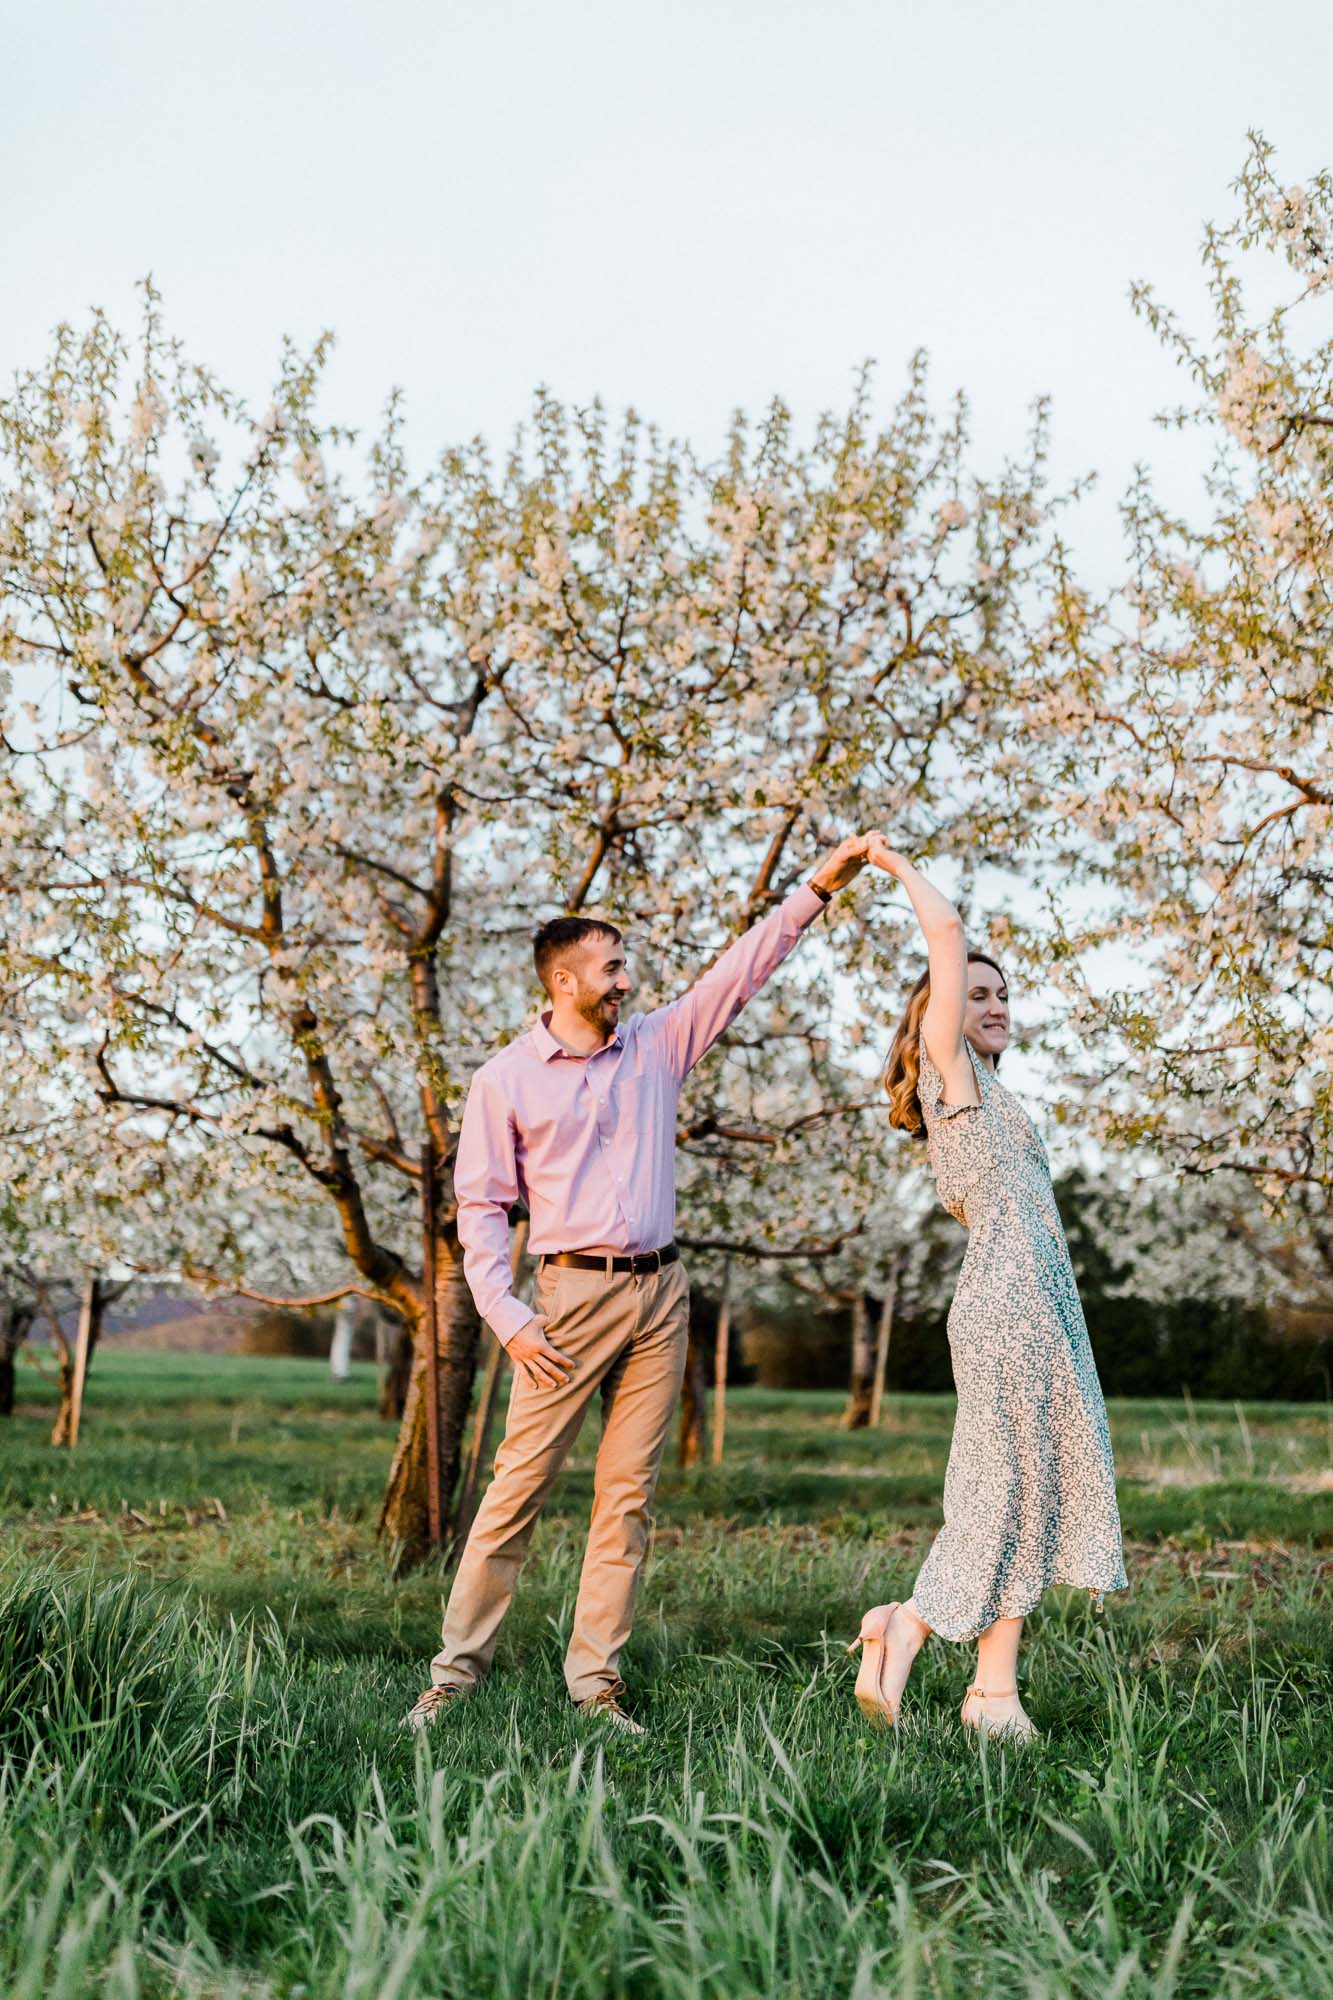 Rohrbachs-Spring-cherry-blossom-engagement-7955.jpg